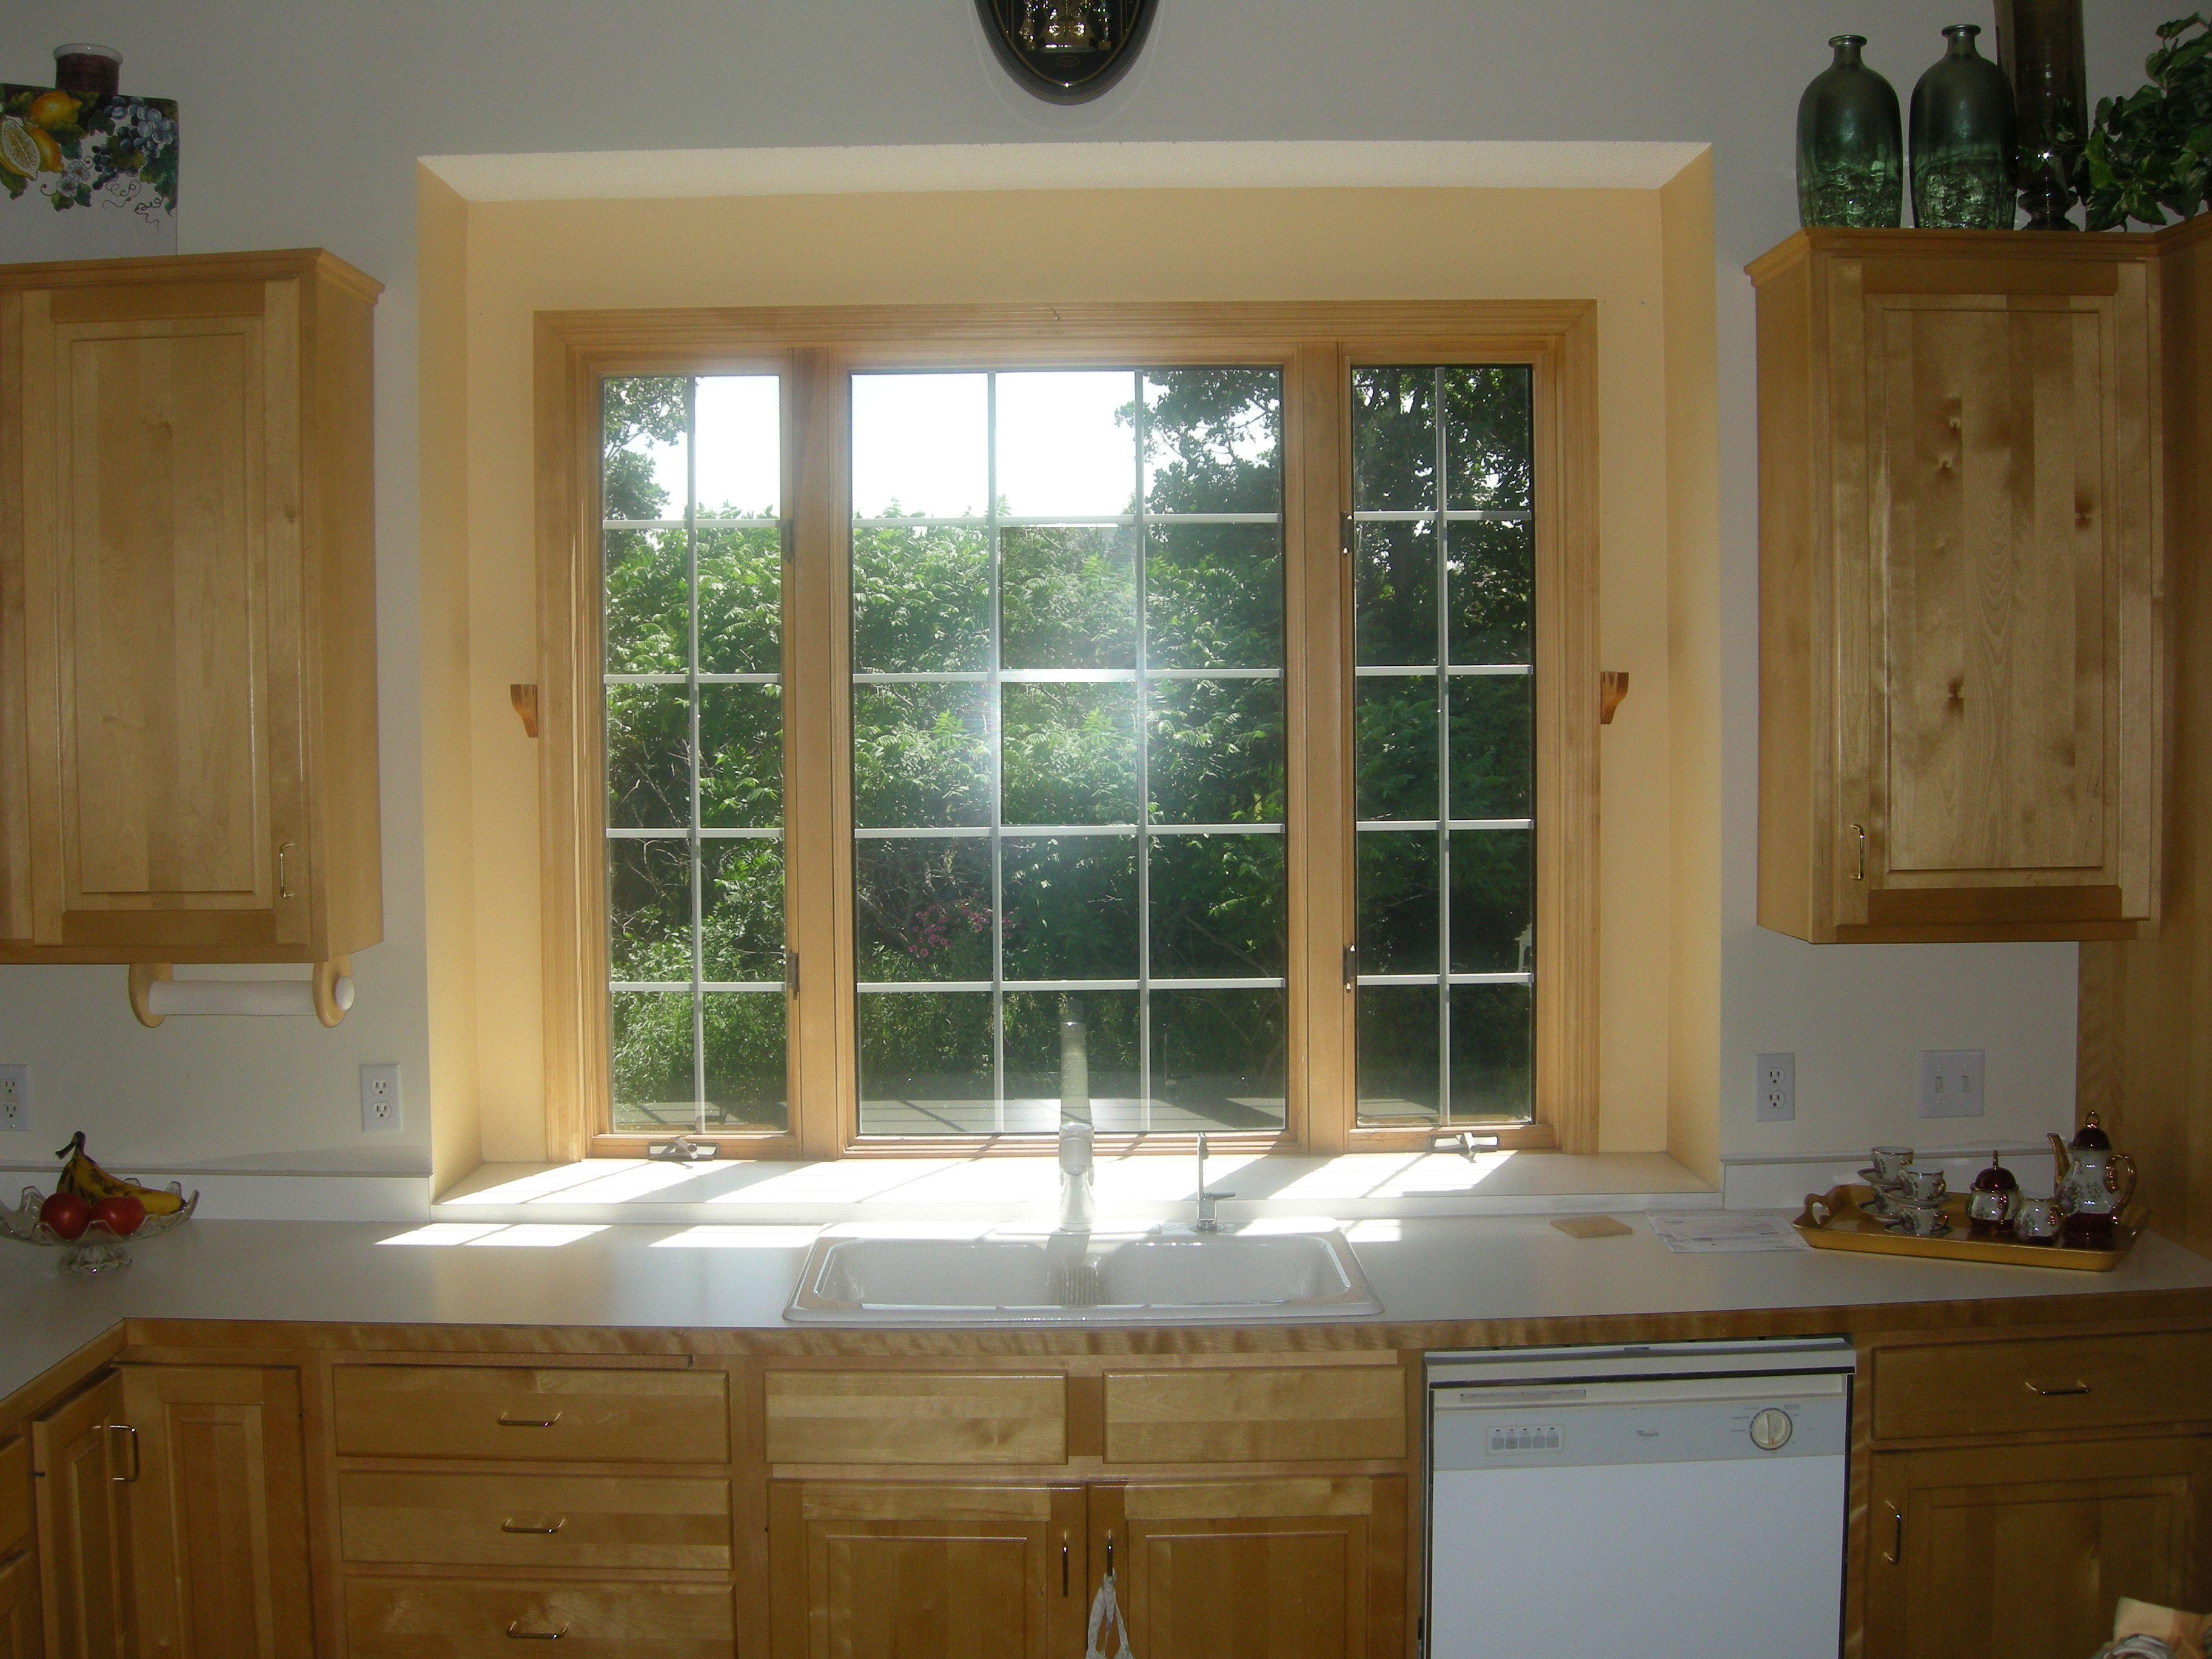 kitchen window ideas treatments play for toddler inspiration smart oak wooden trim as treatment